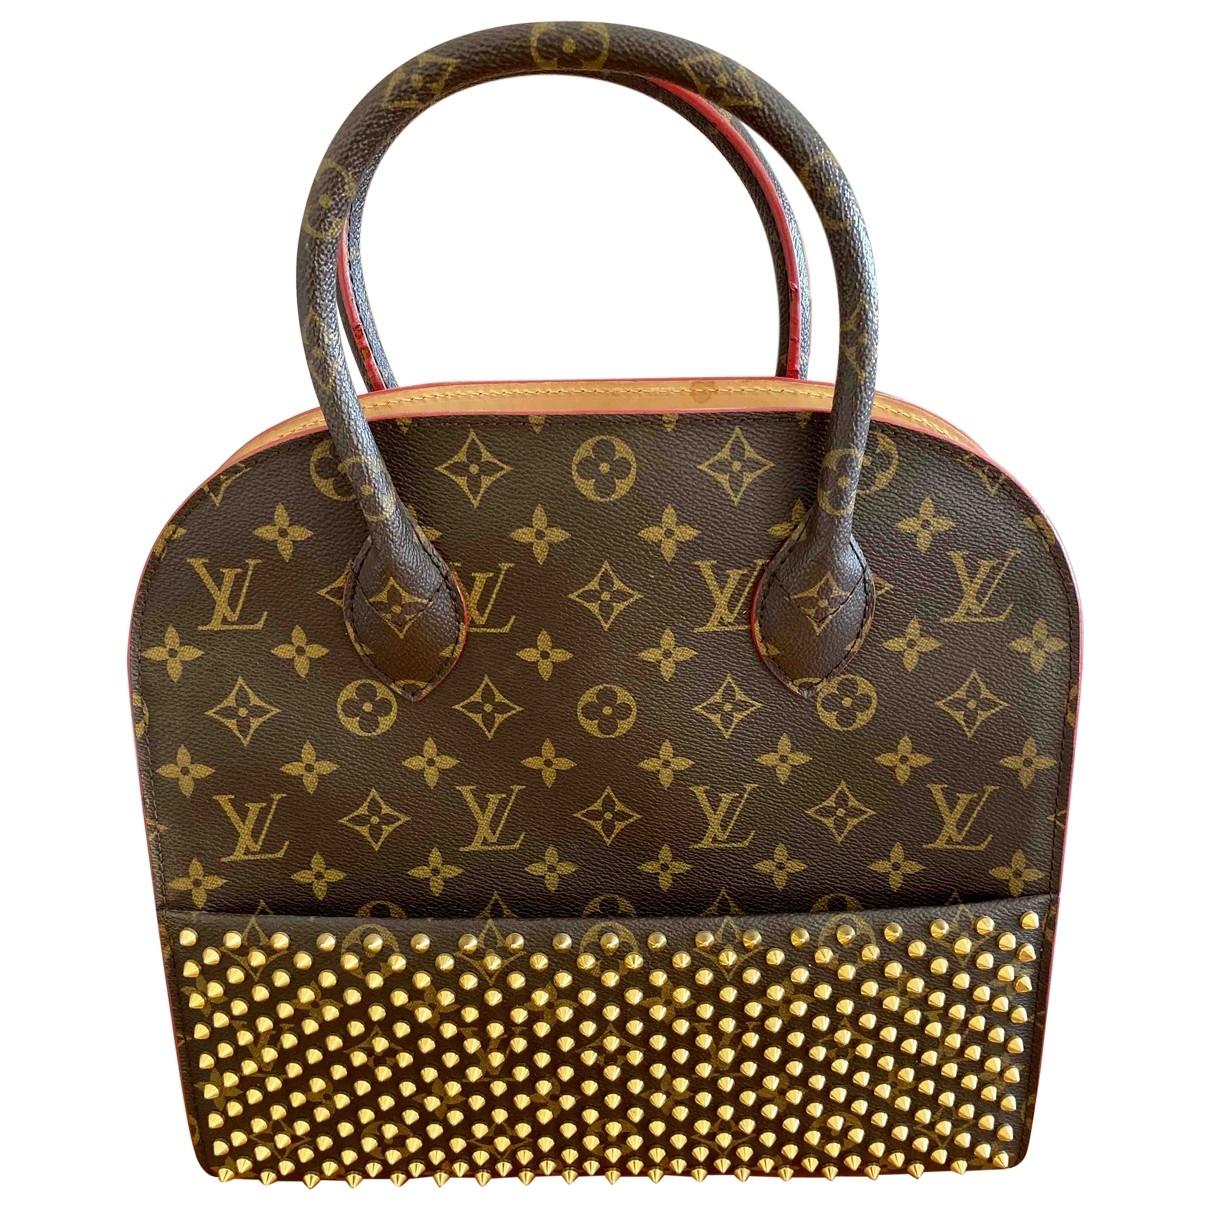 Louis Vuitton Shopping Bag Louboutin Handtasche in  Bunt Leinen